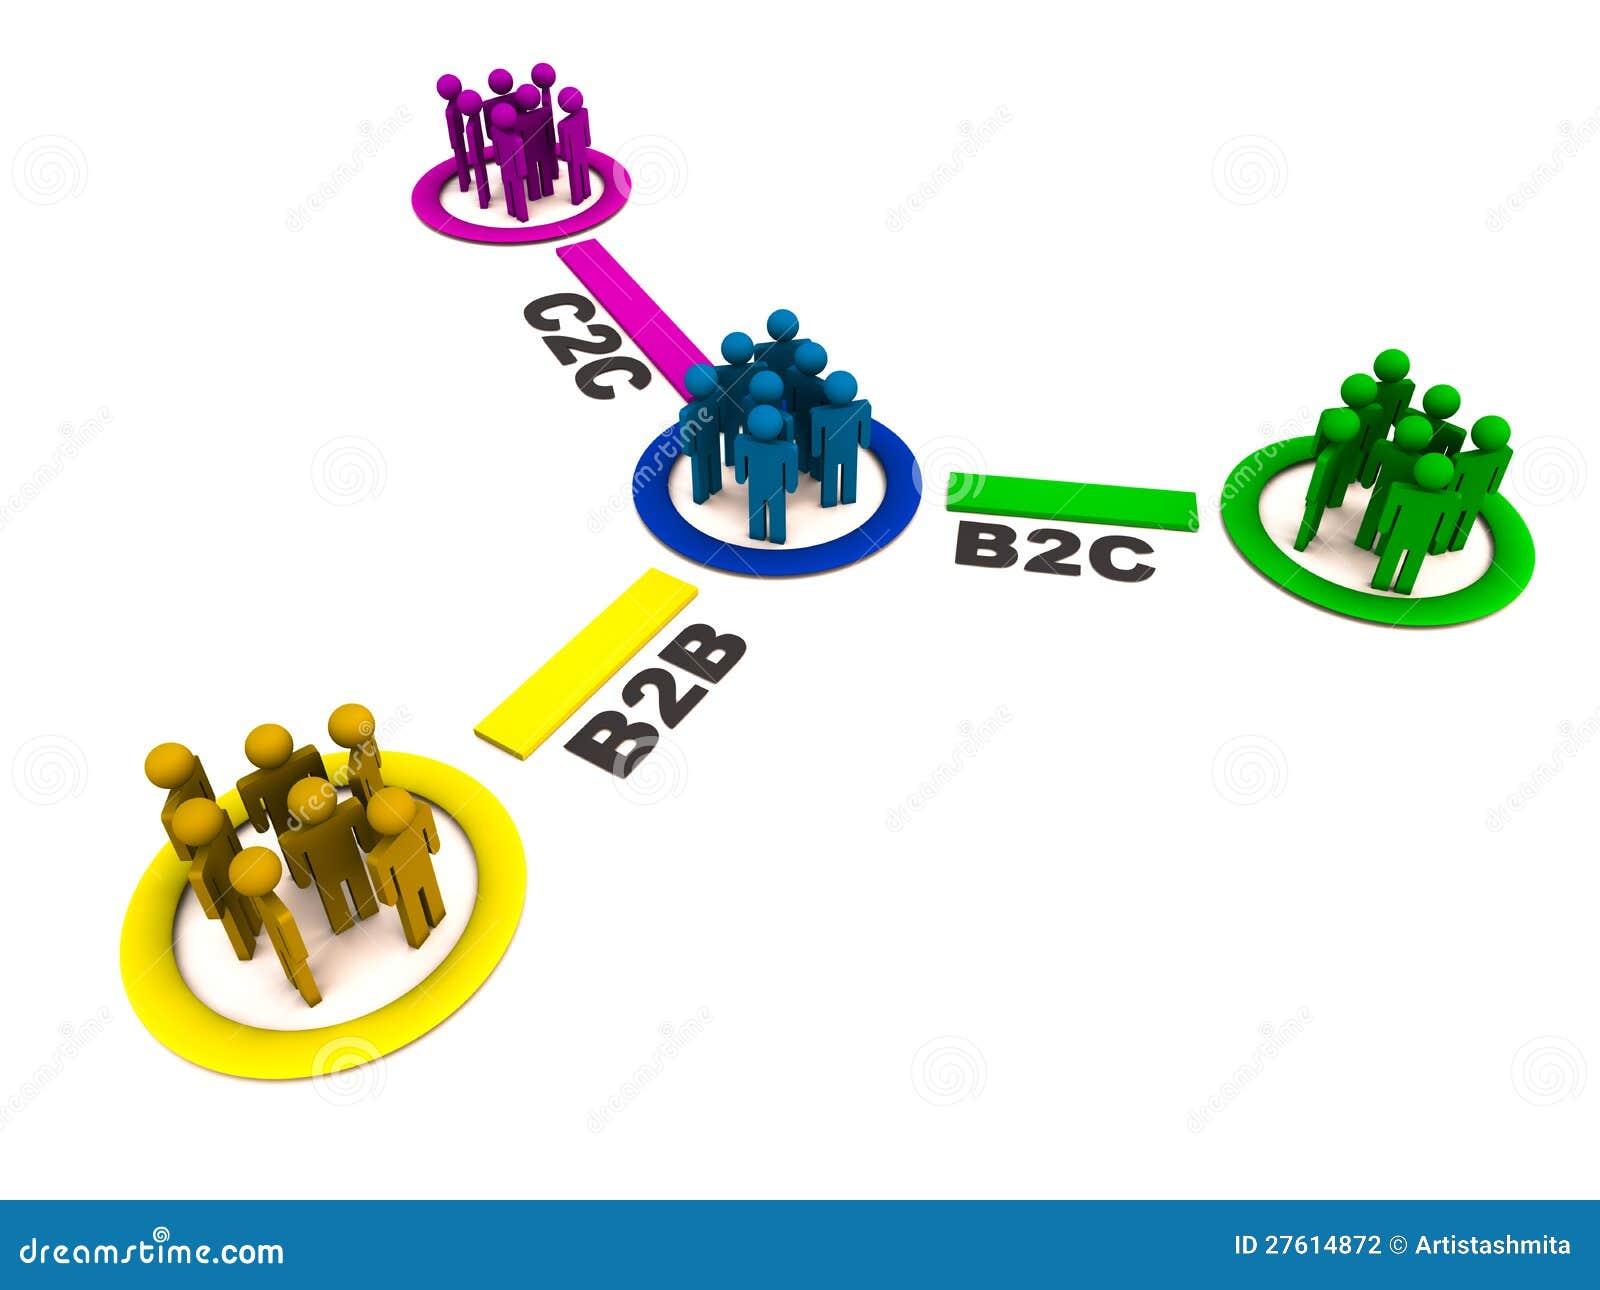 C2c business plan